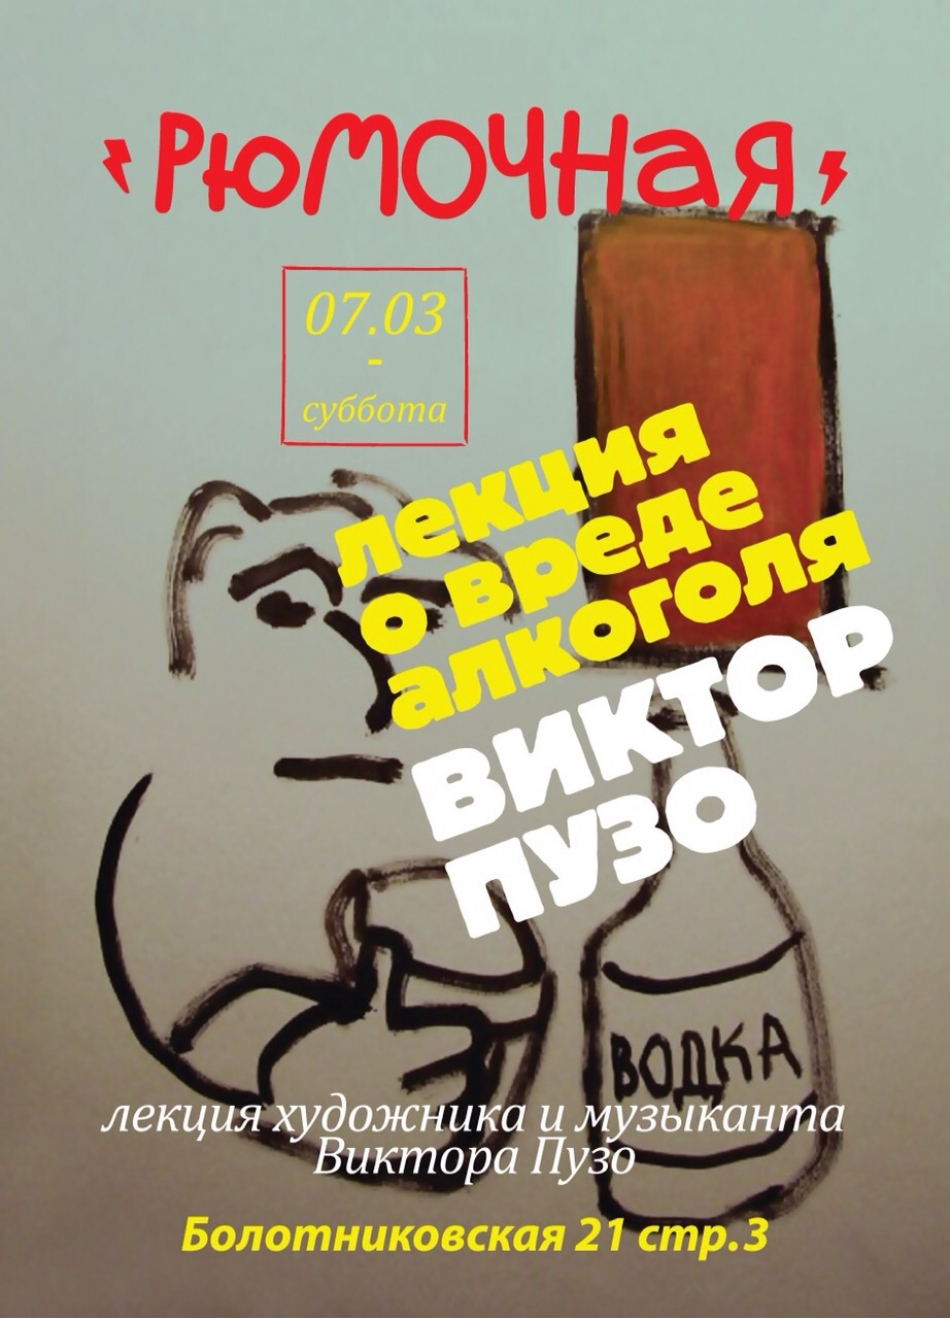 Рюмочная Виктор Пузо